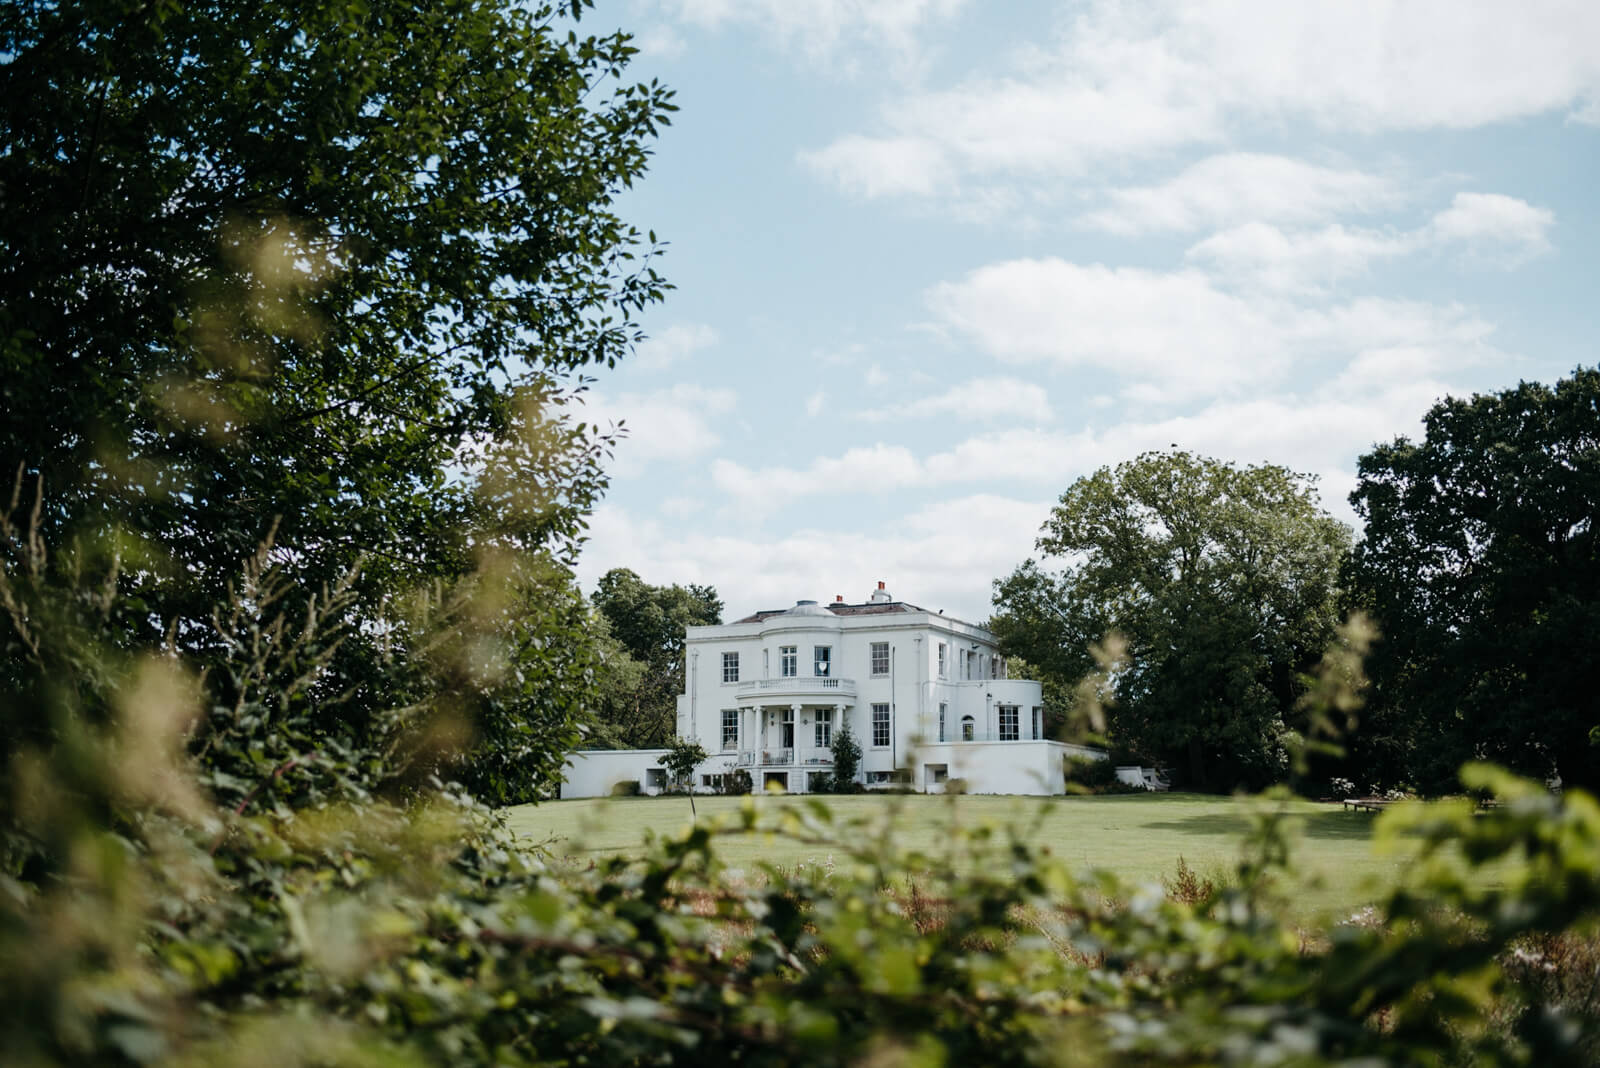 Belair House wedding venue in West Dulwich, London